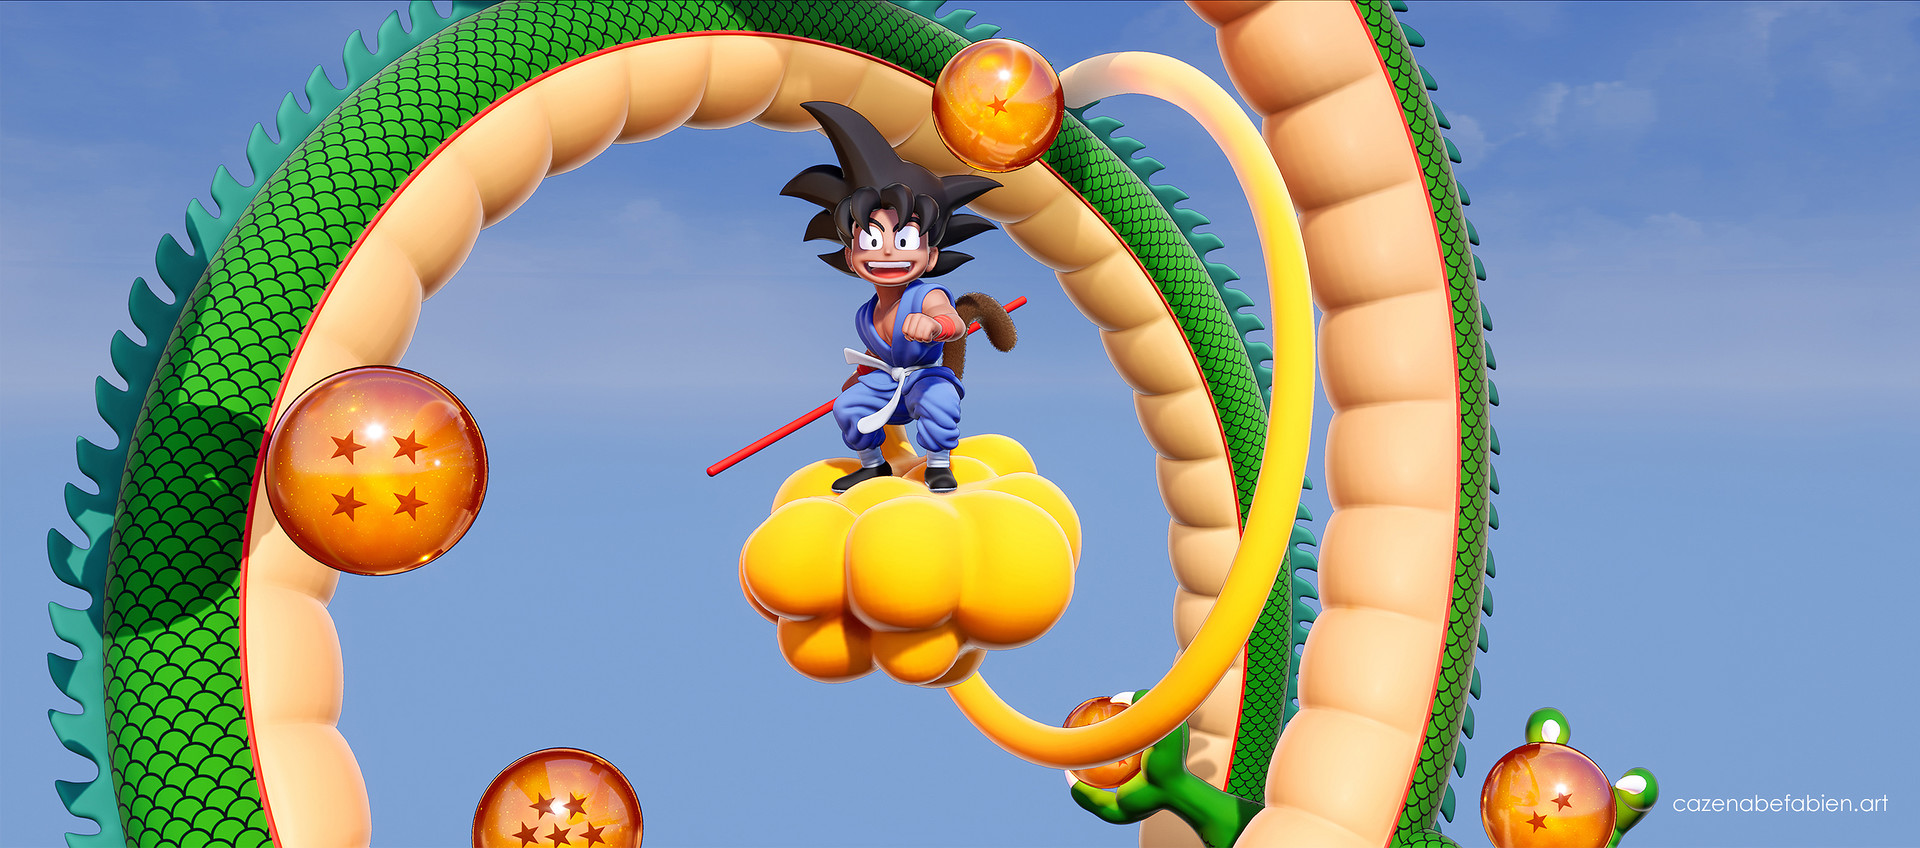 Fabien cazenabe sangoku dragon ball sculpt zbrush unreal 3d 13